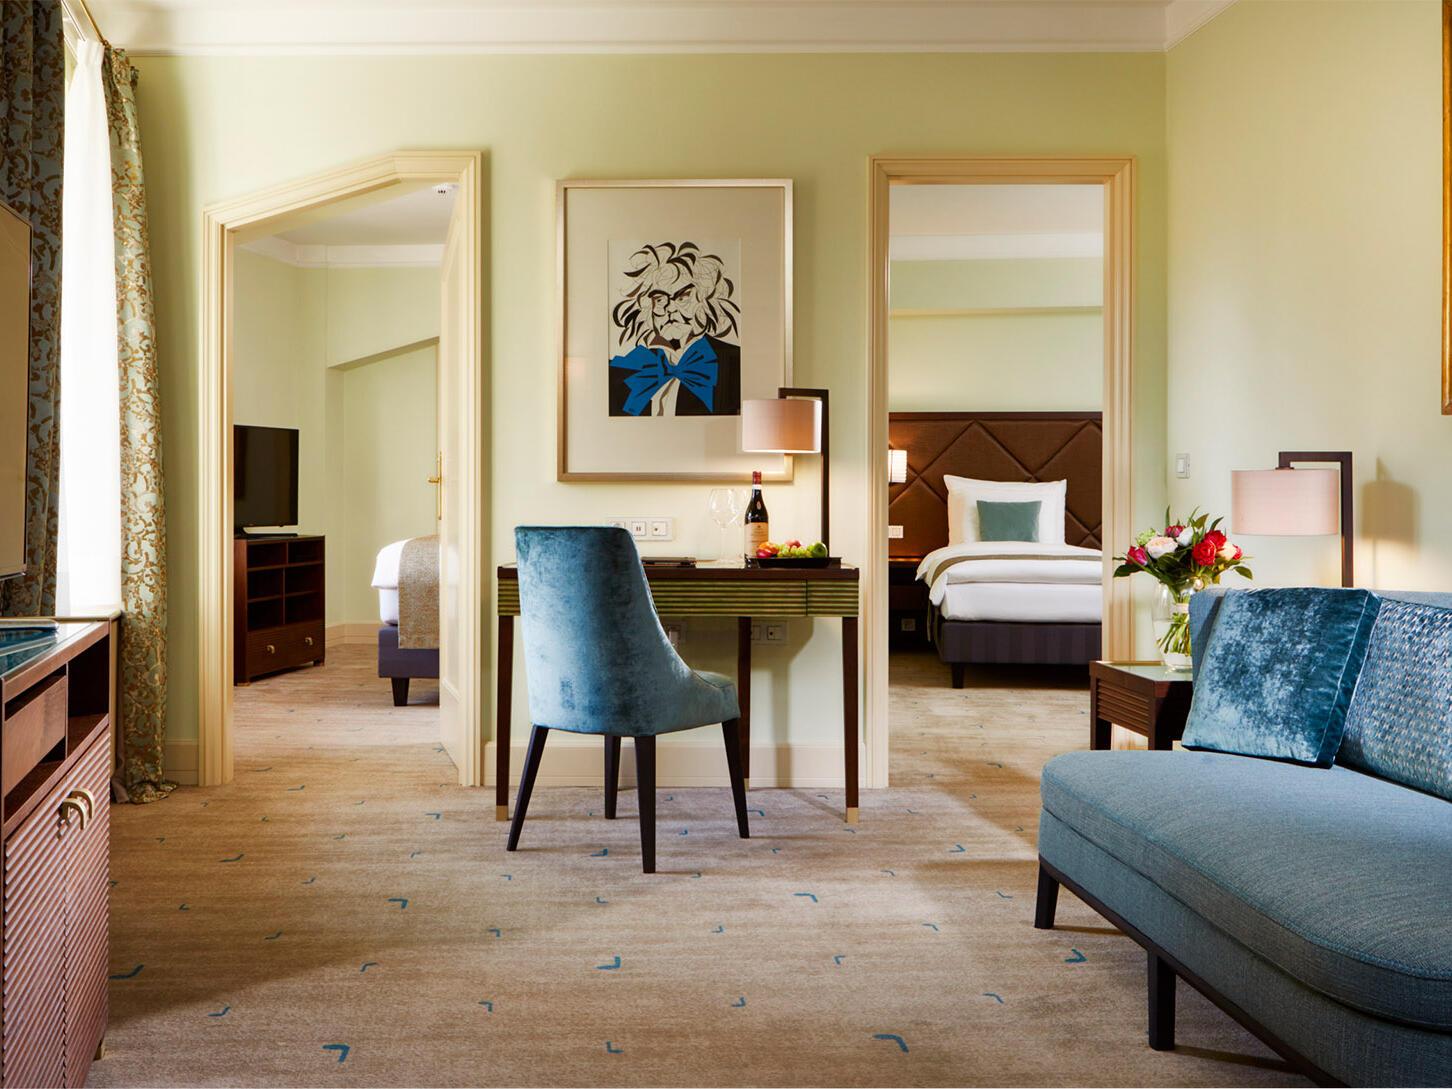 Beethoven Luxury Suite at Aria Hotel in Prague